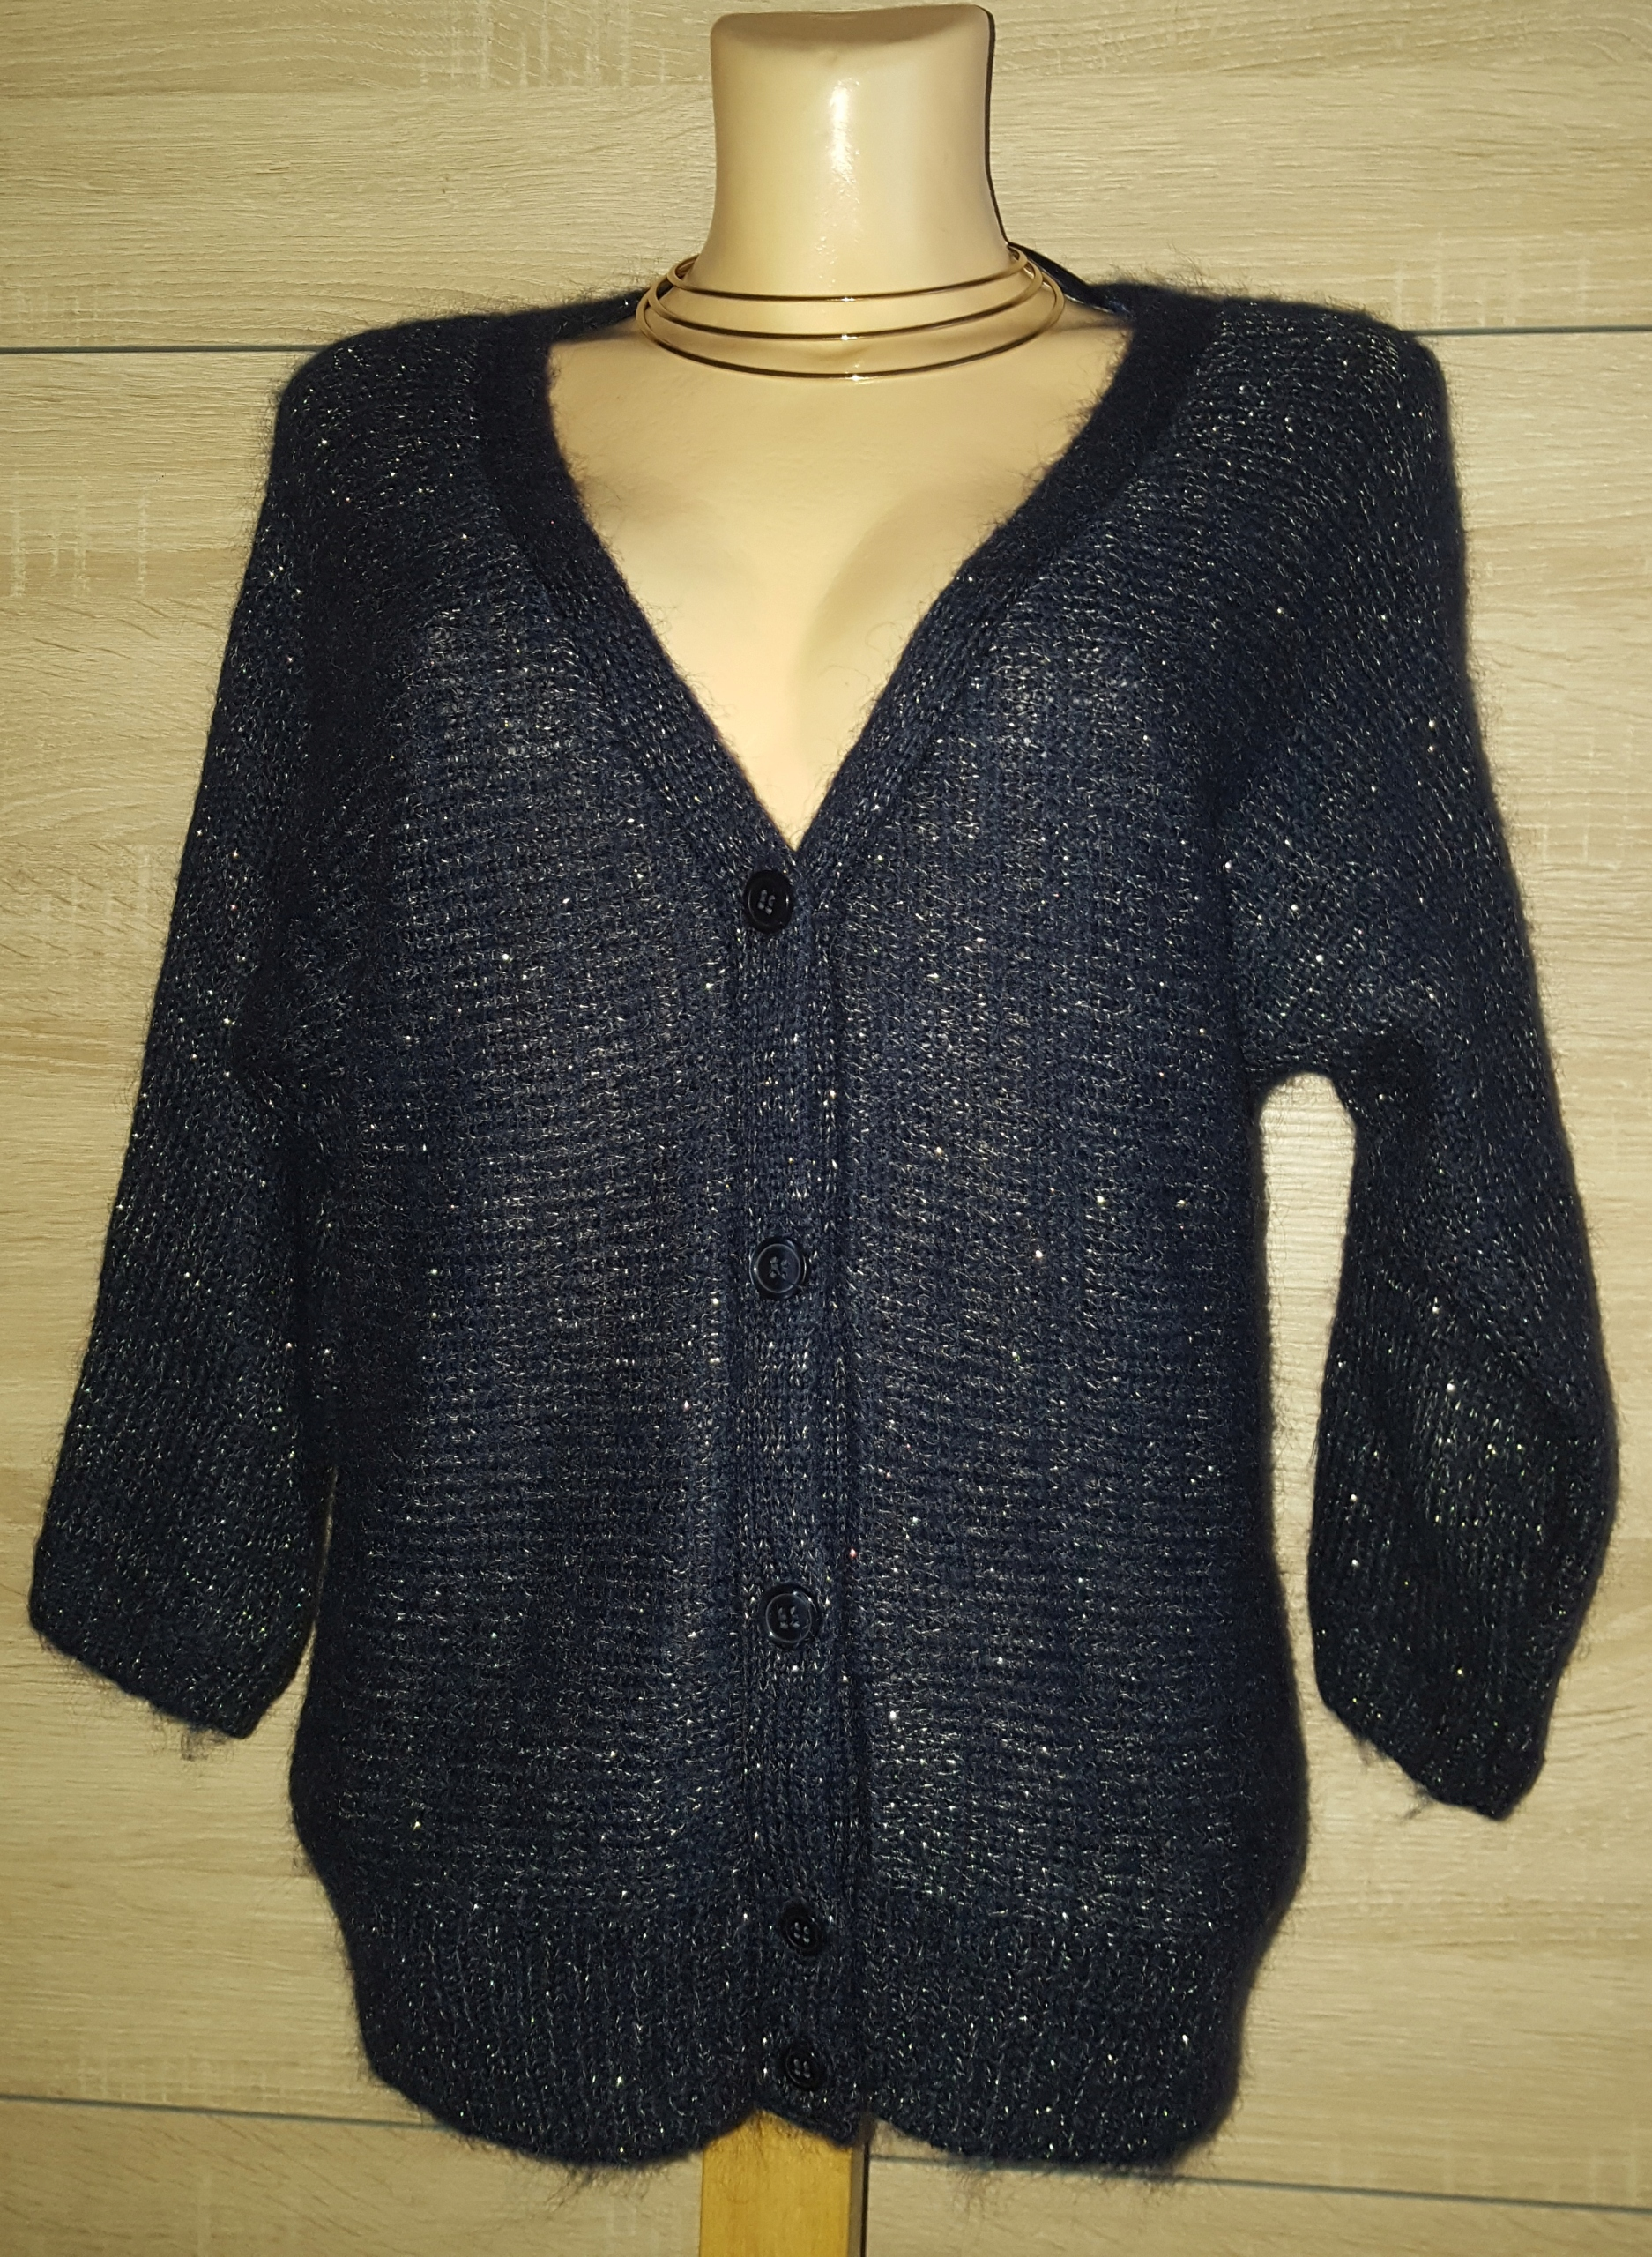 Sweterek damski H&M rozpinany rozmiar M.